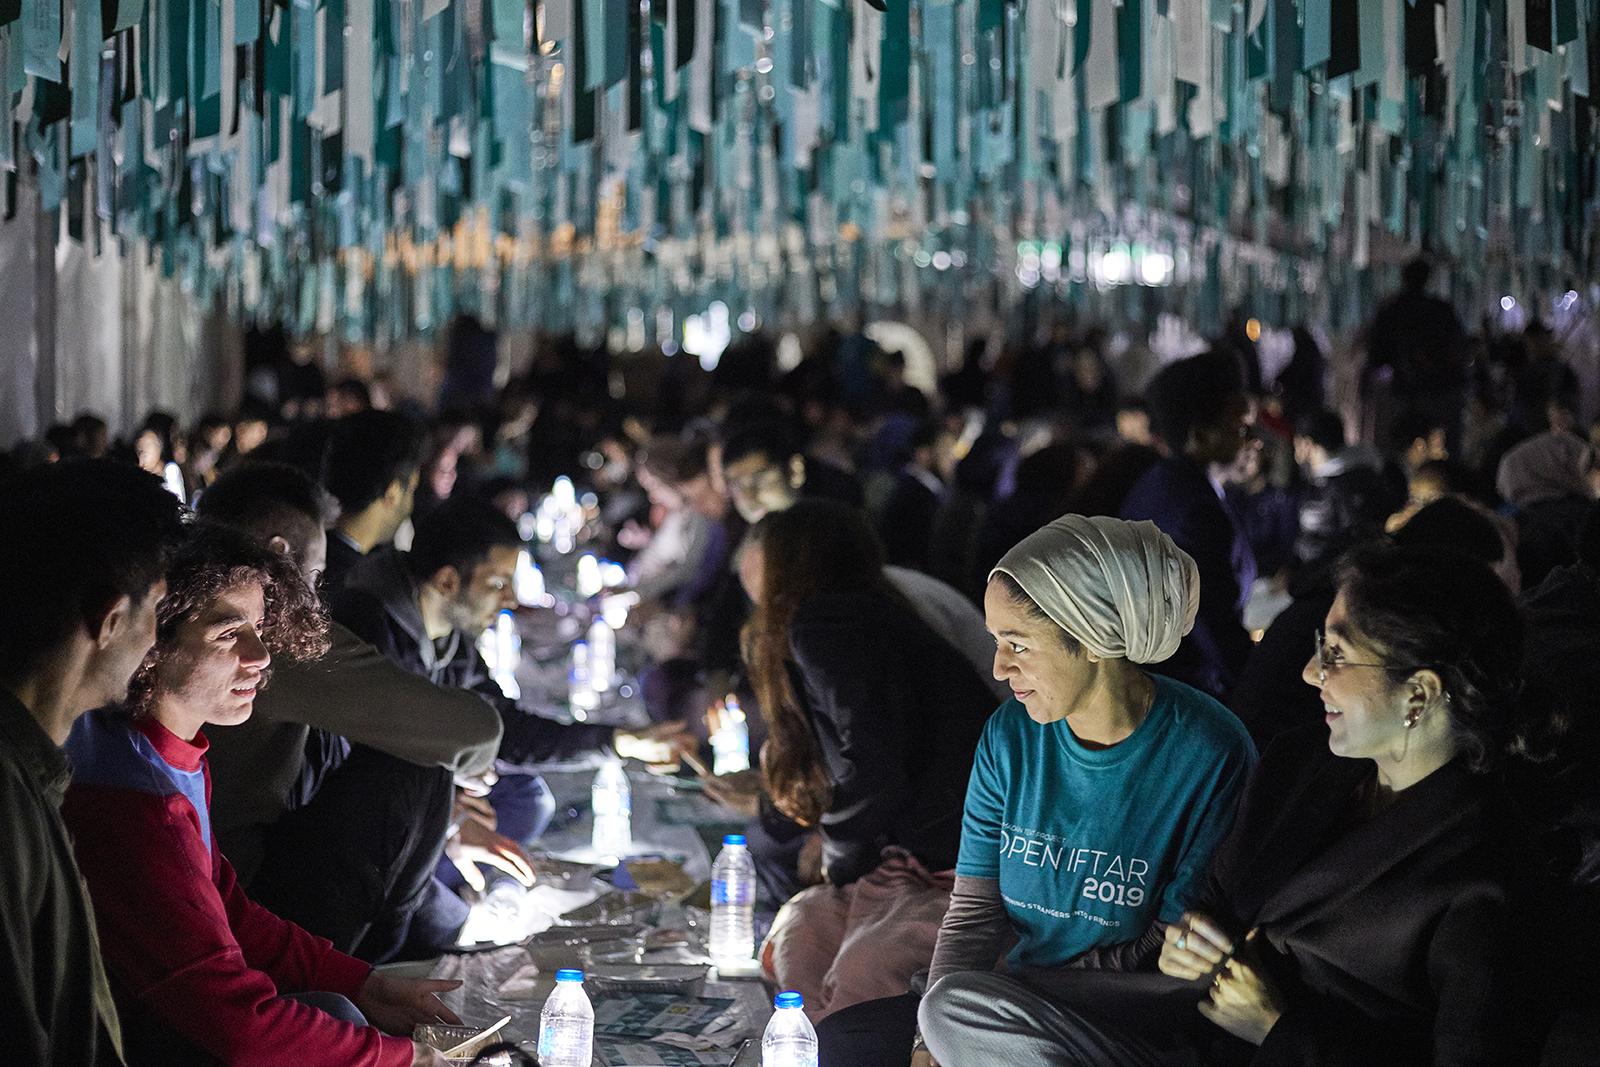 Ramadan Tent Project returns its Open Iftar, feeding hundreds of Muslims